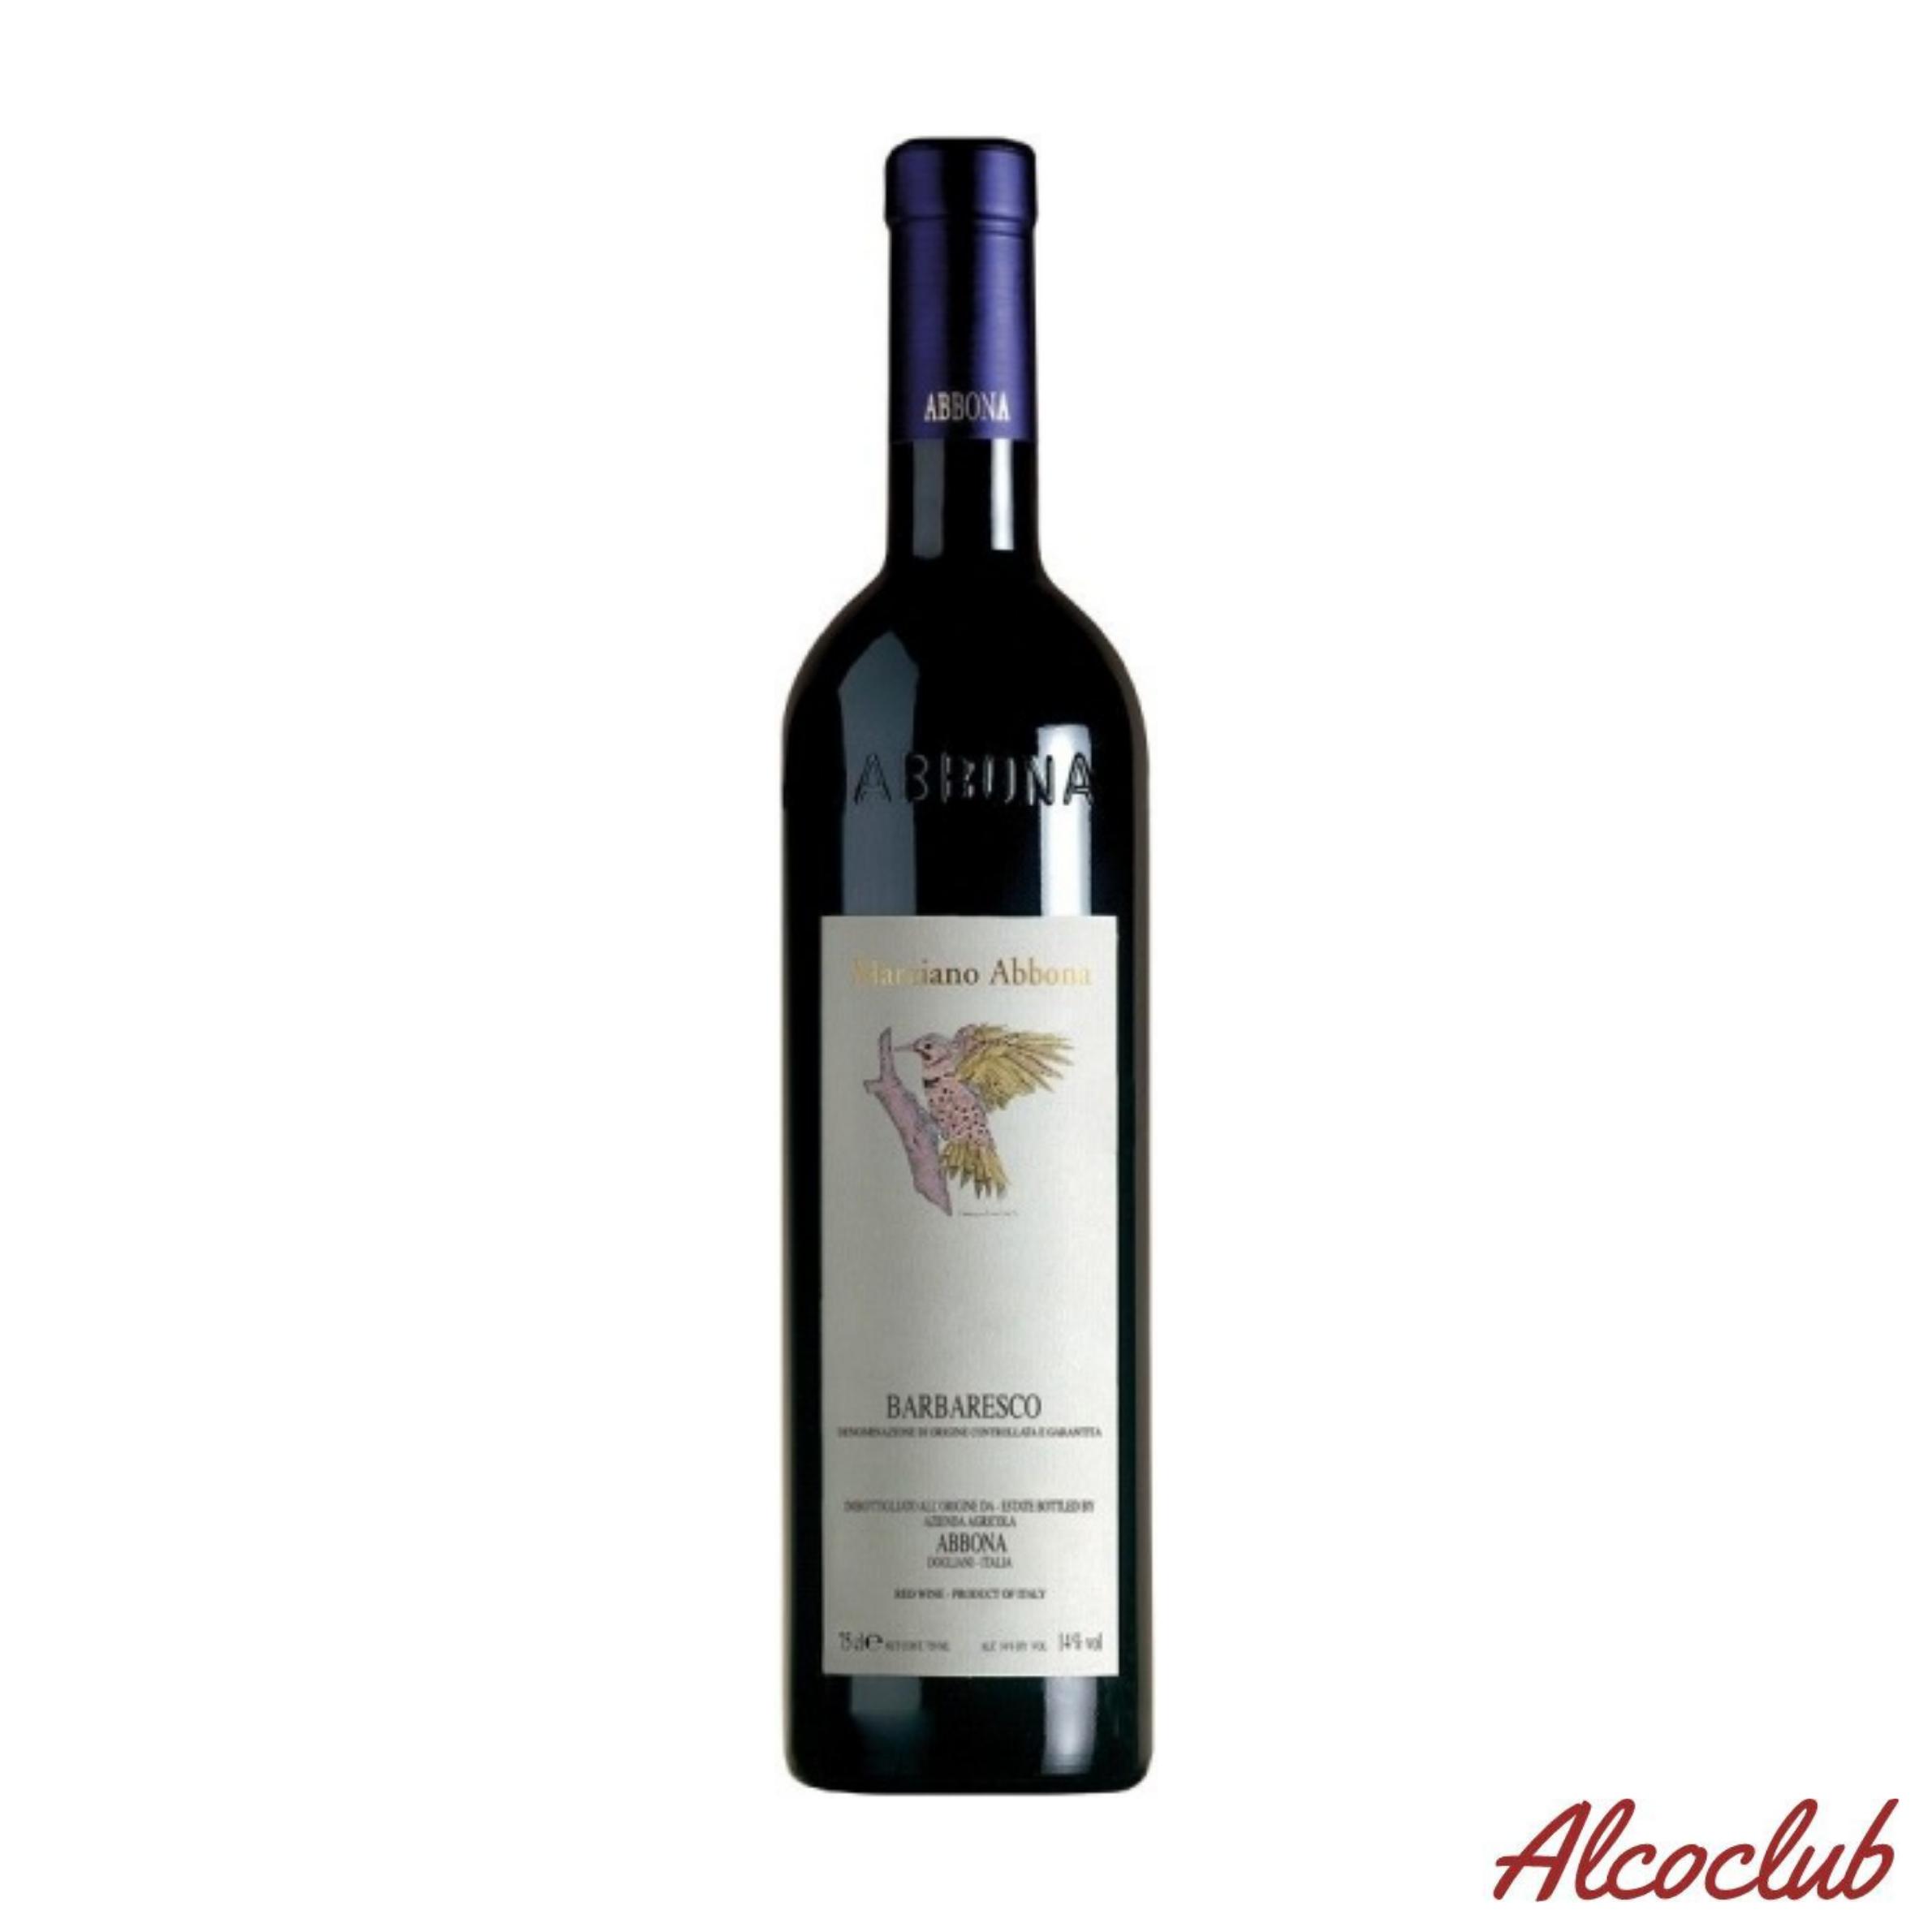 Купить в Украине вино Abbona Barbaresco DOCG 2016 Италия